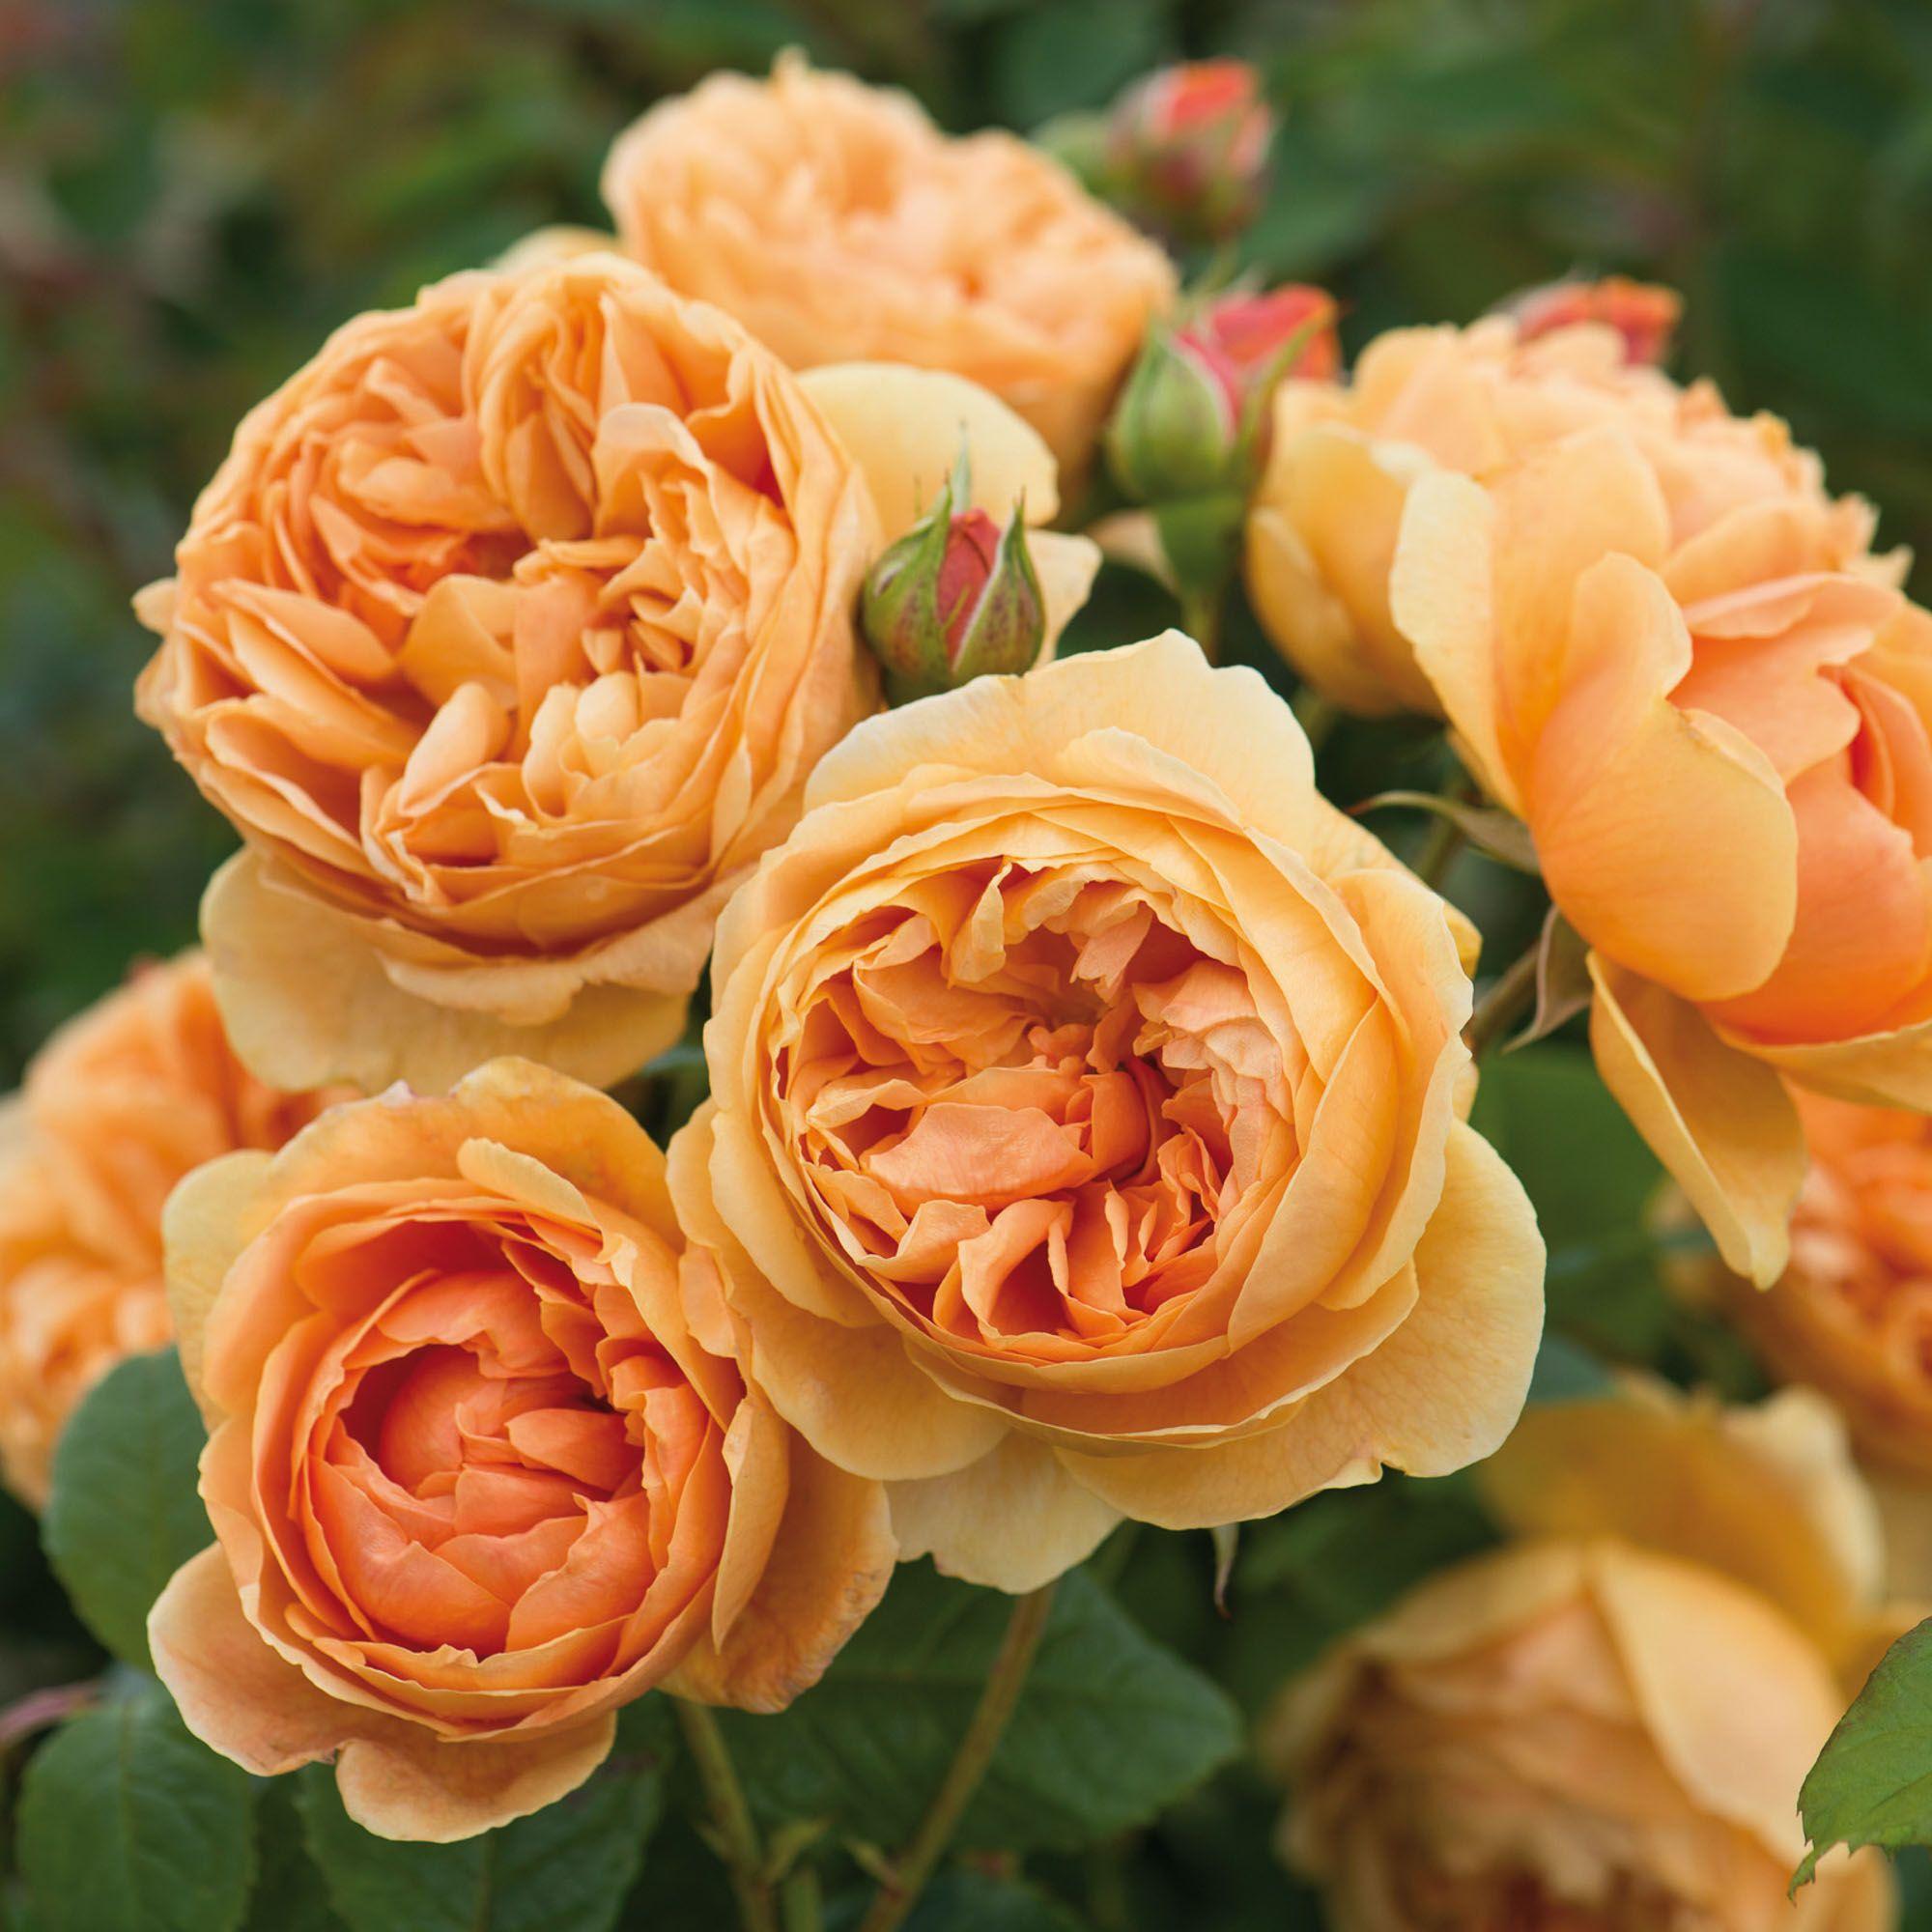 The new David Austin shrub rose Rosa Carolyn Knight